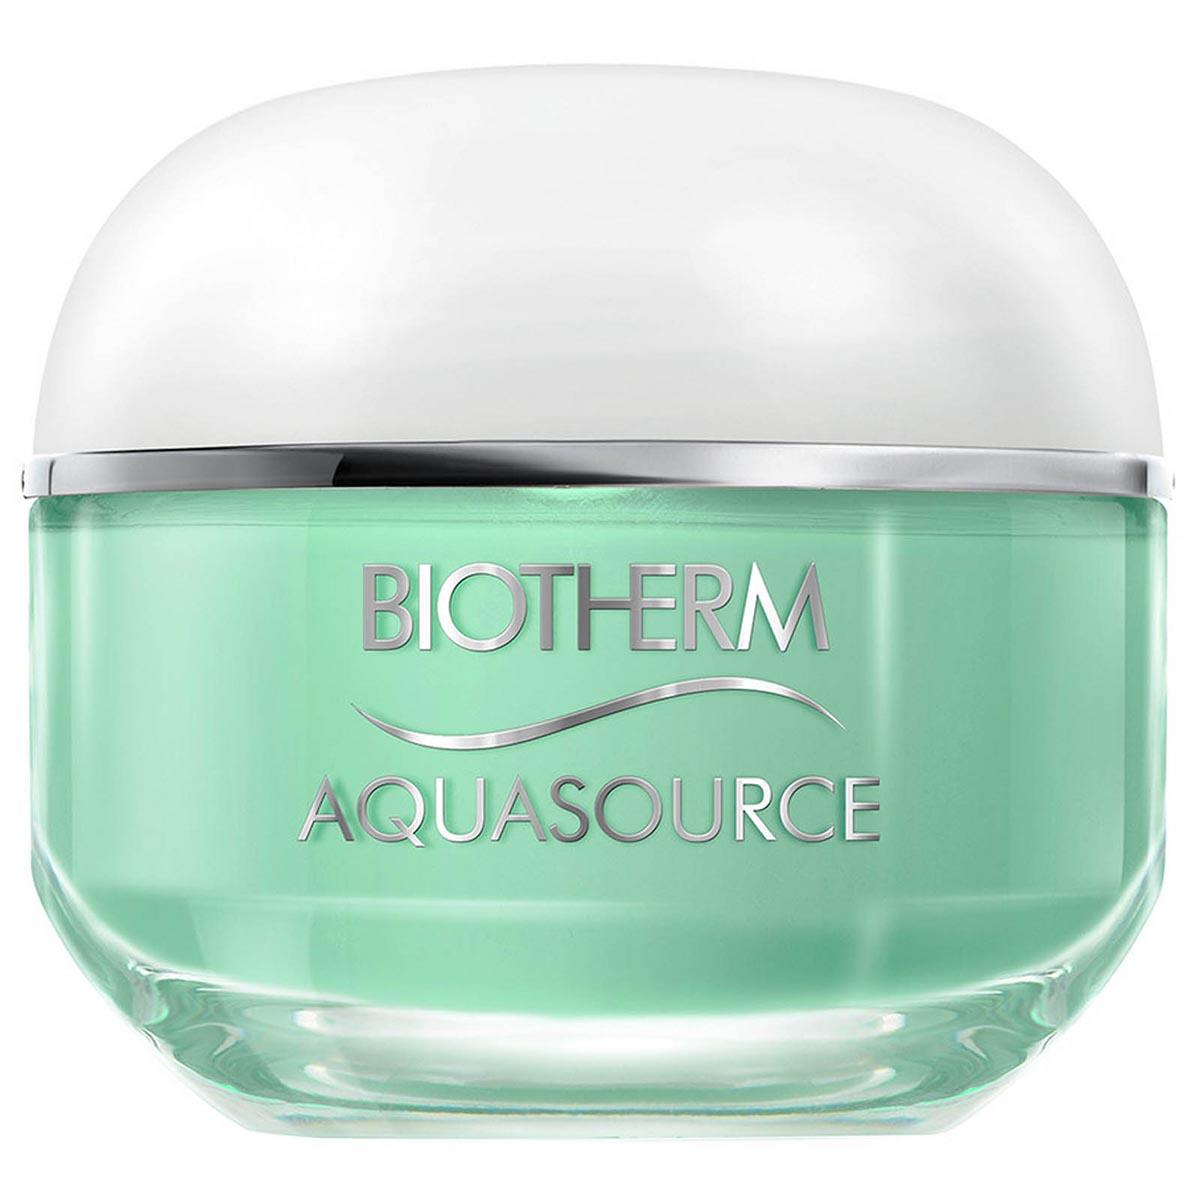 Biotherm aquasource creme piel normal 50ml